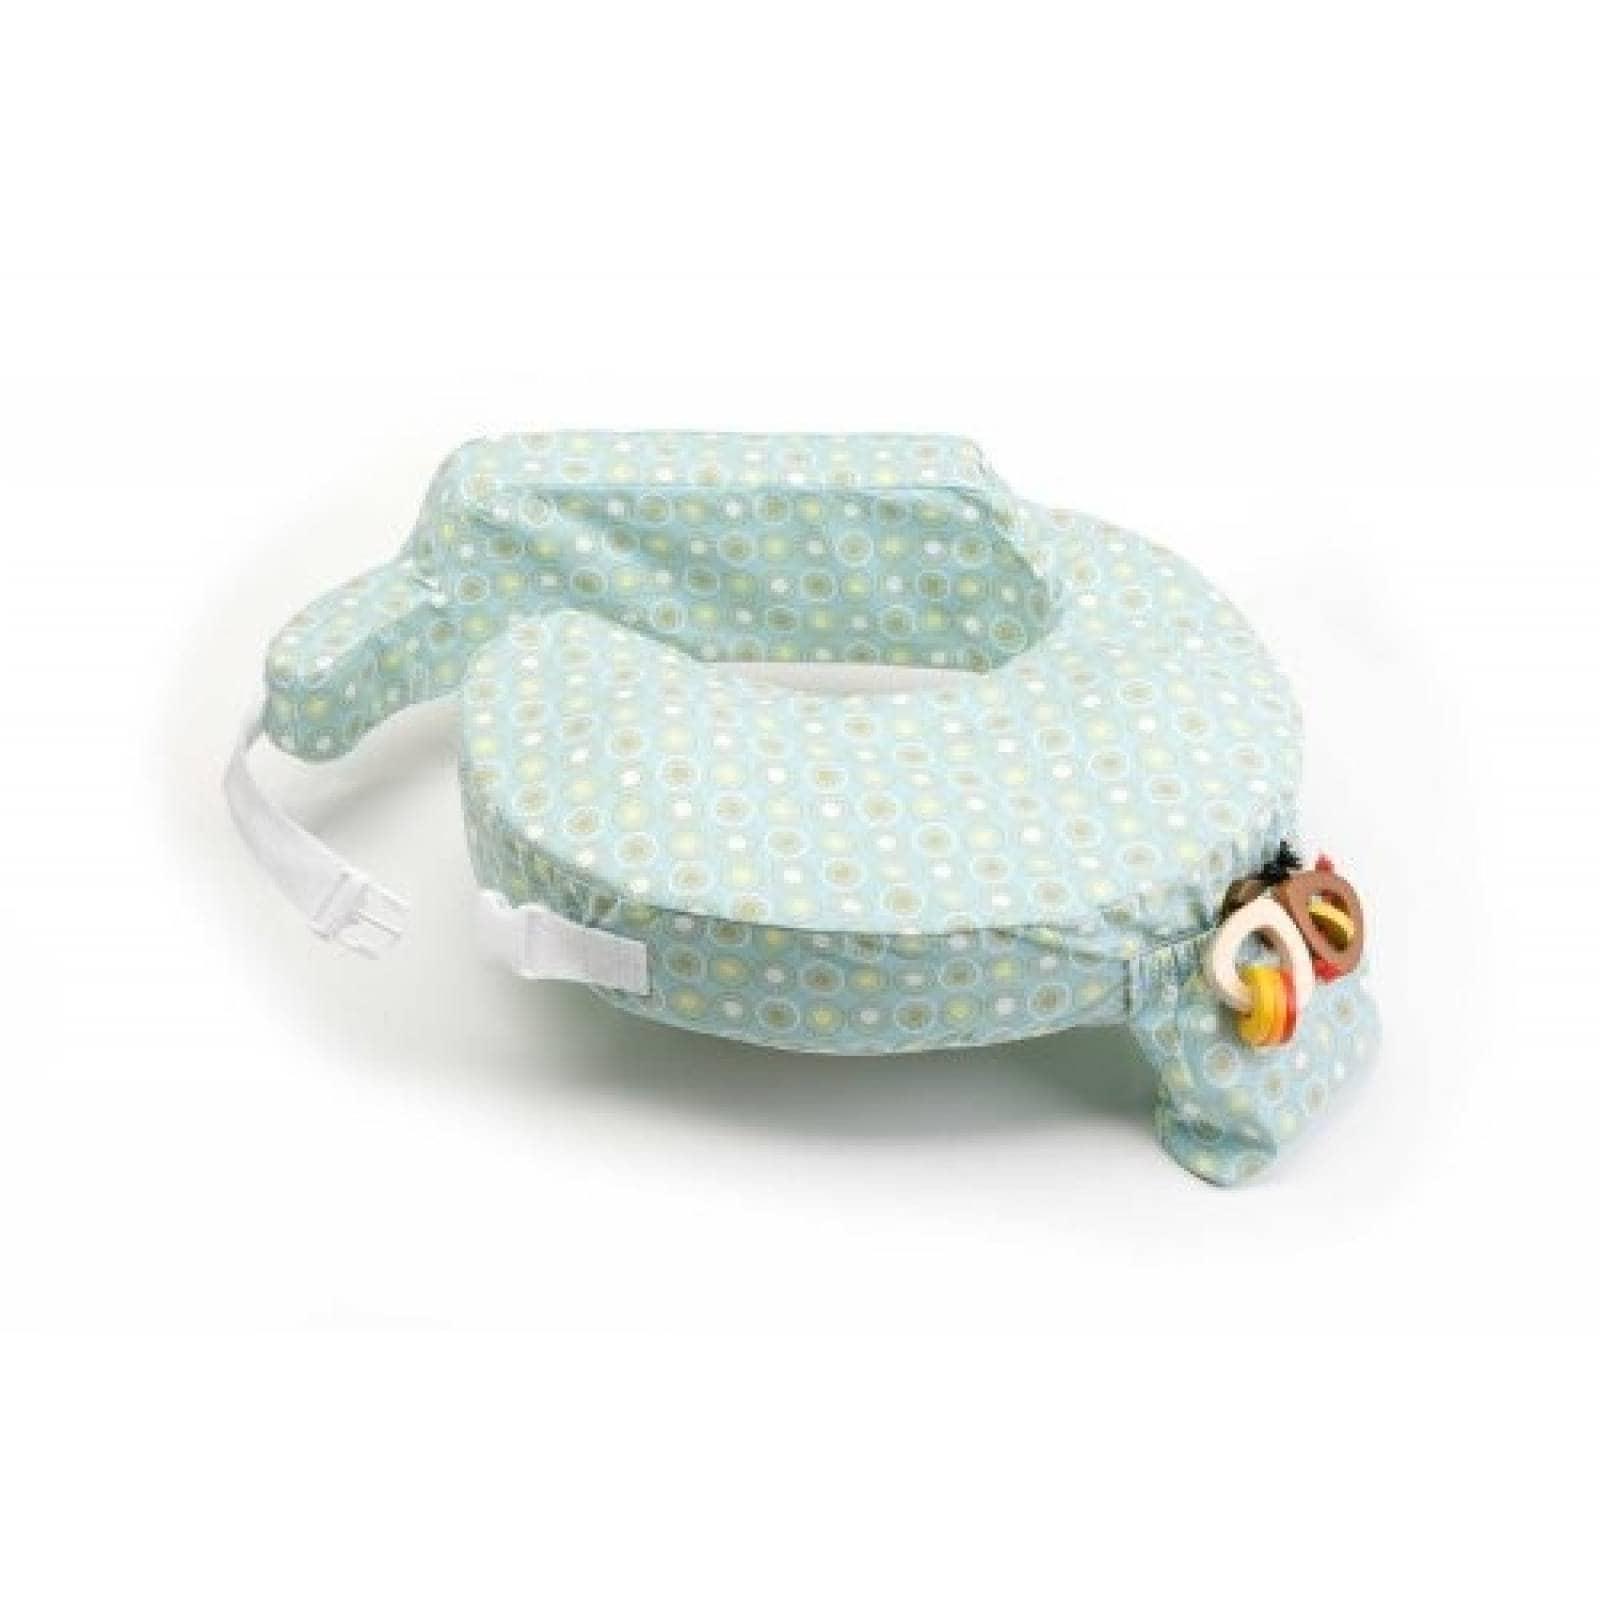 Almohada para lactancia My Brest Friend Original -Azul claro